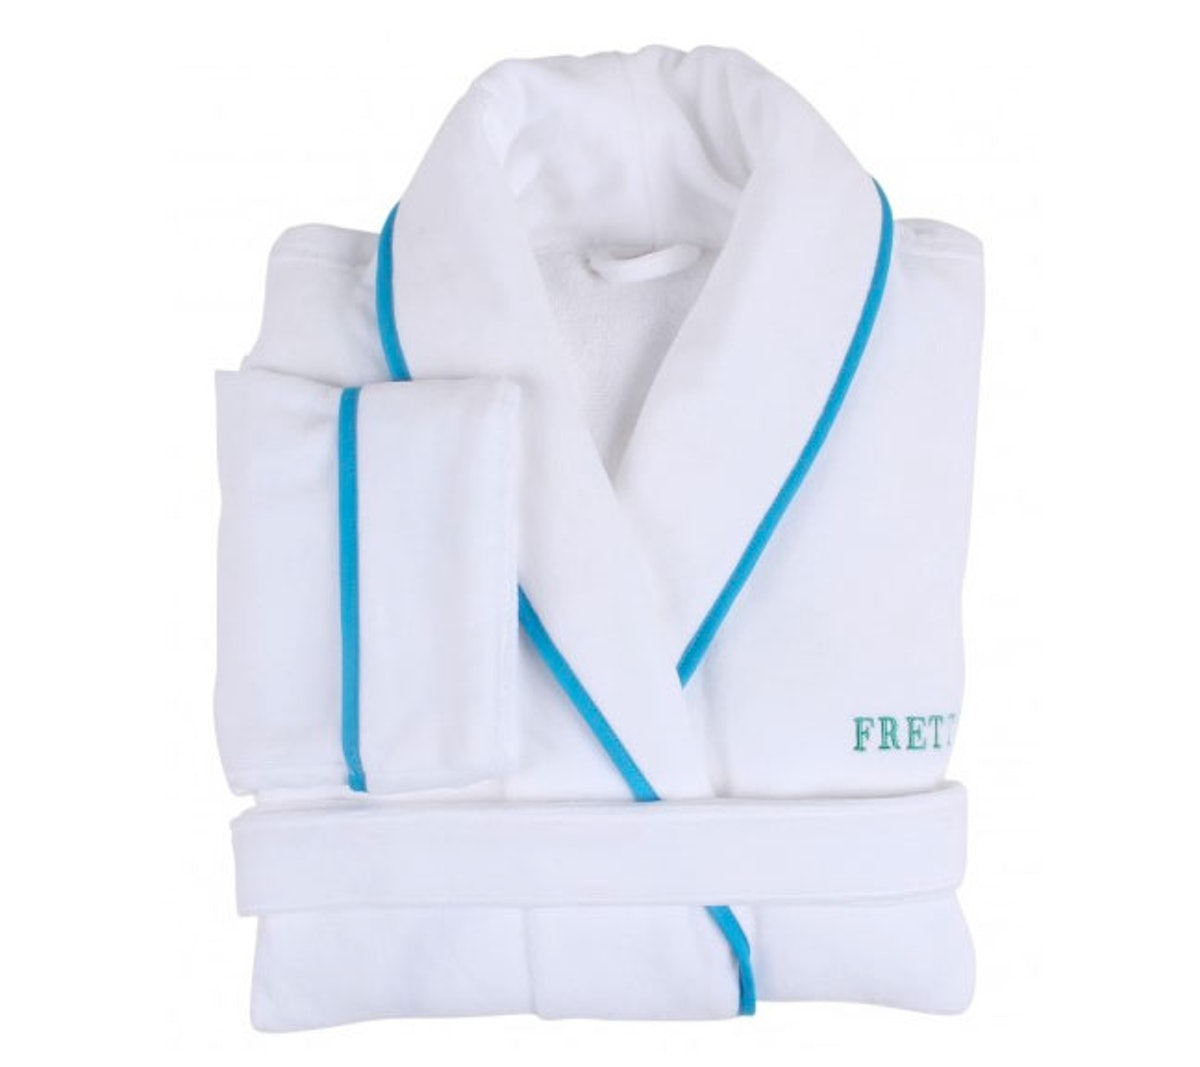 Frette Robe